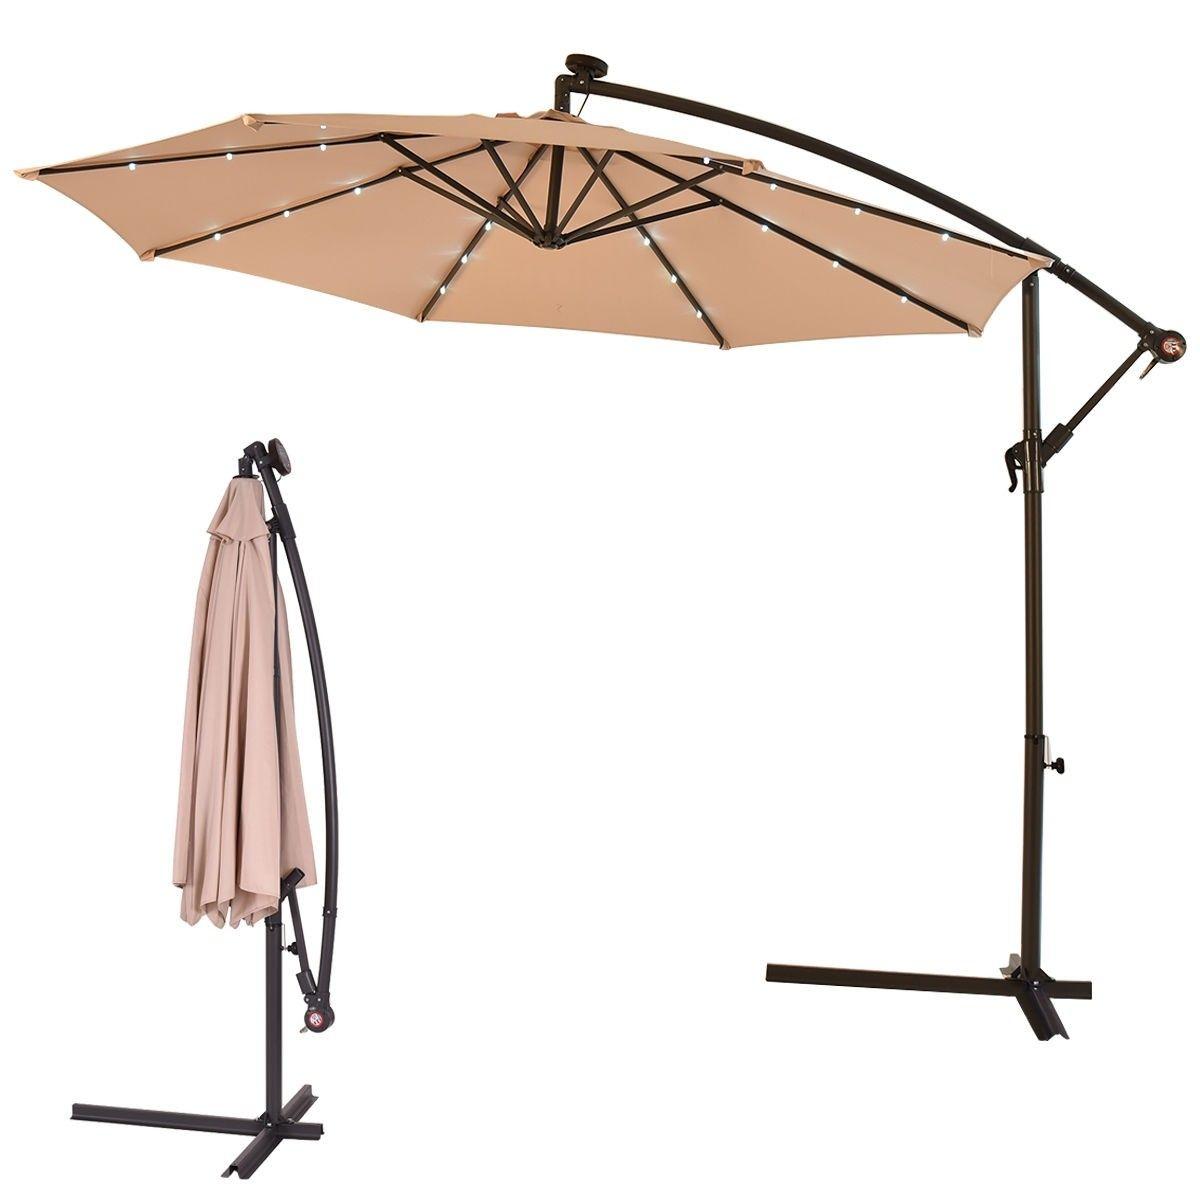 10 Patio Hanging Umbrella Sun Shade With Solar Led Lights Patio Umbrella Patio Patio Sun Shades